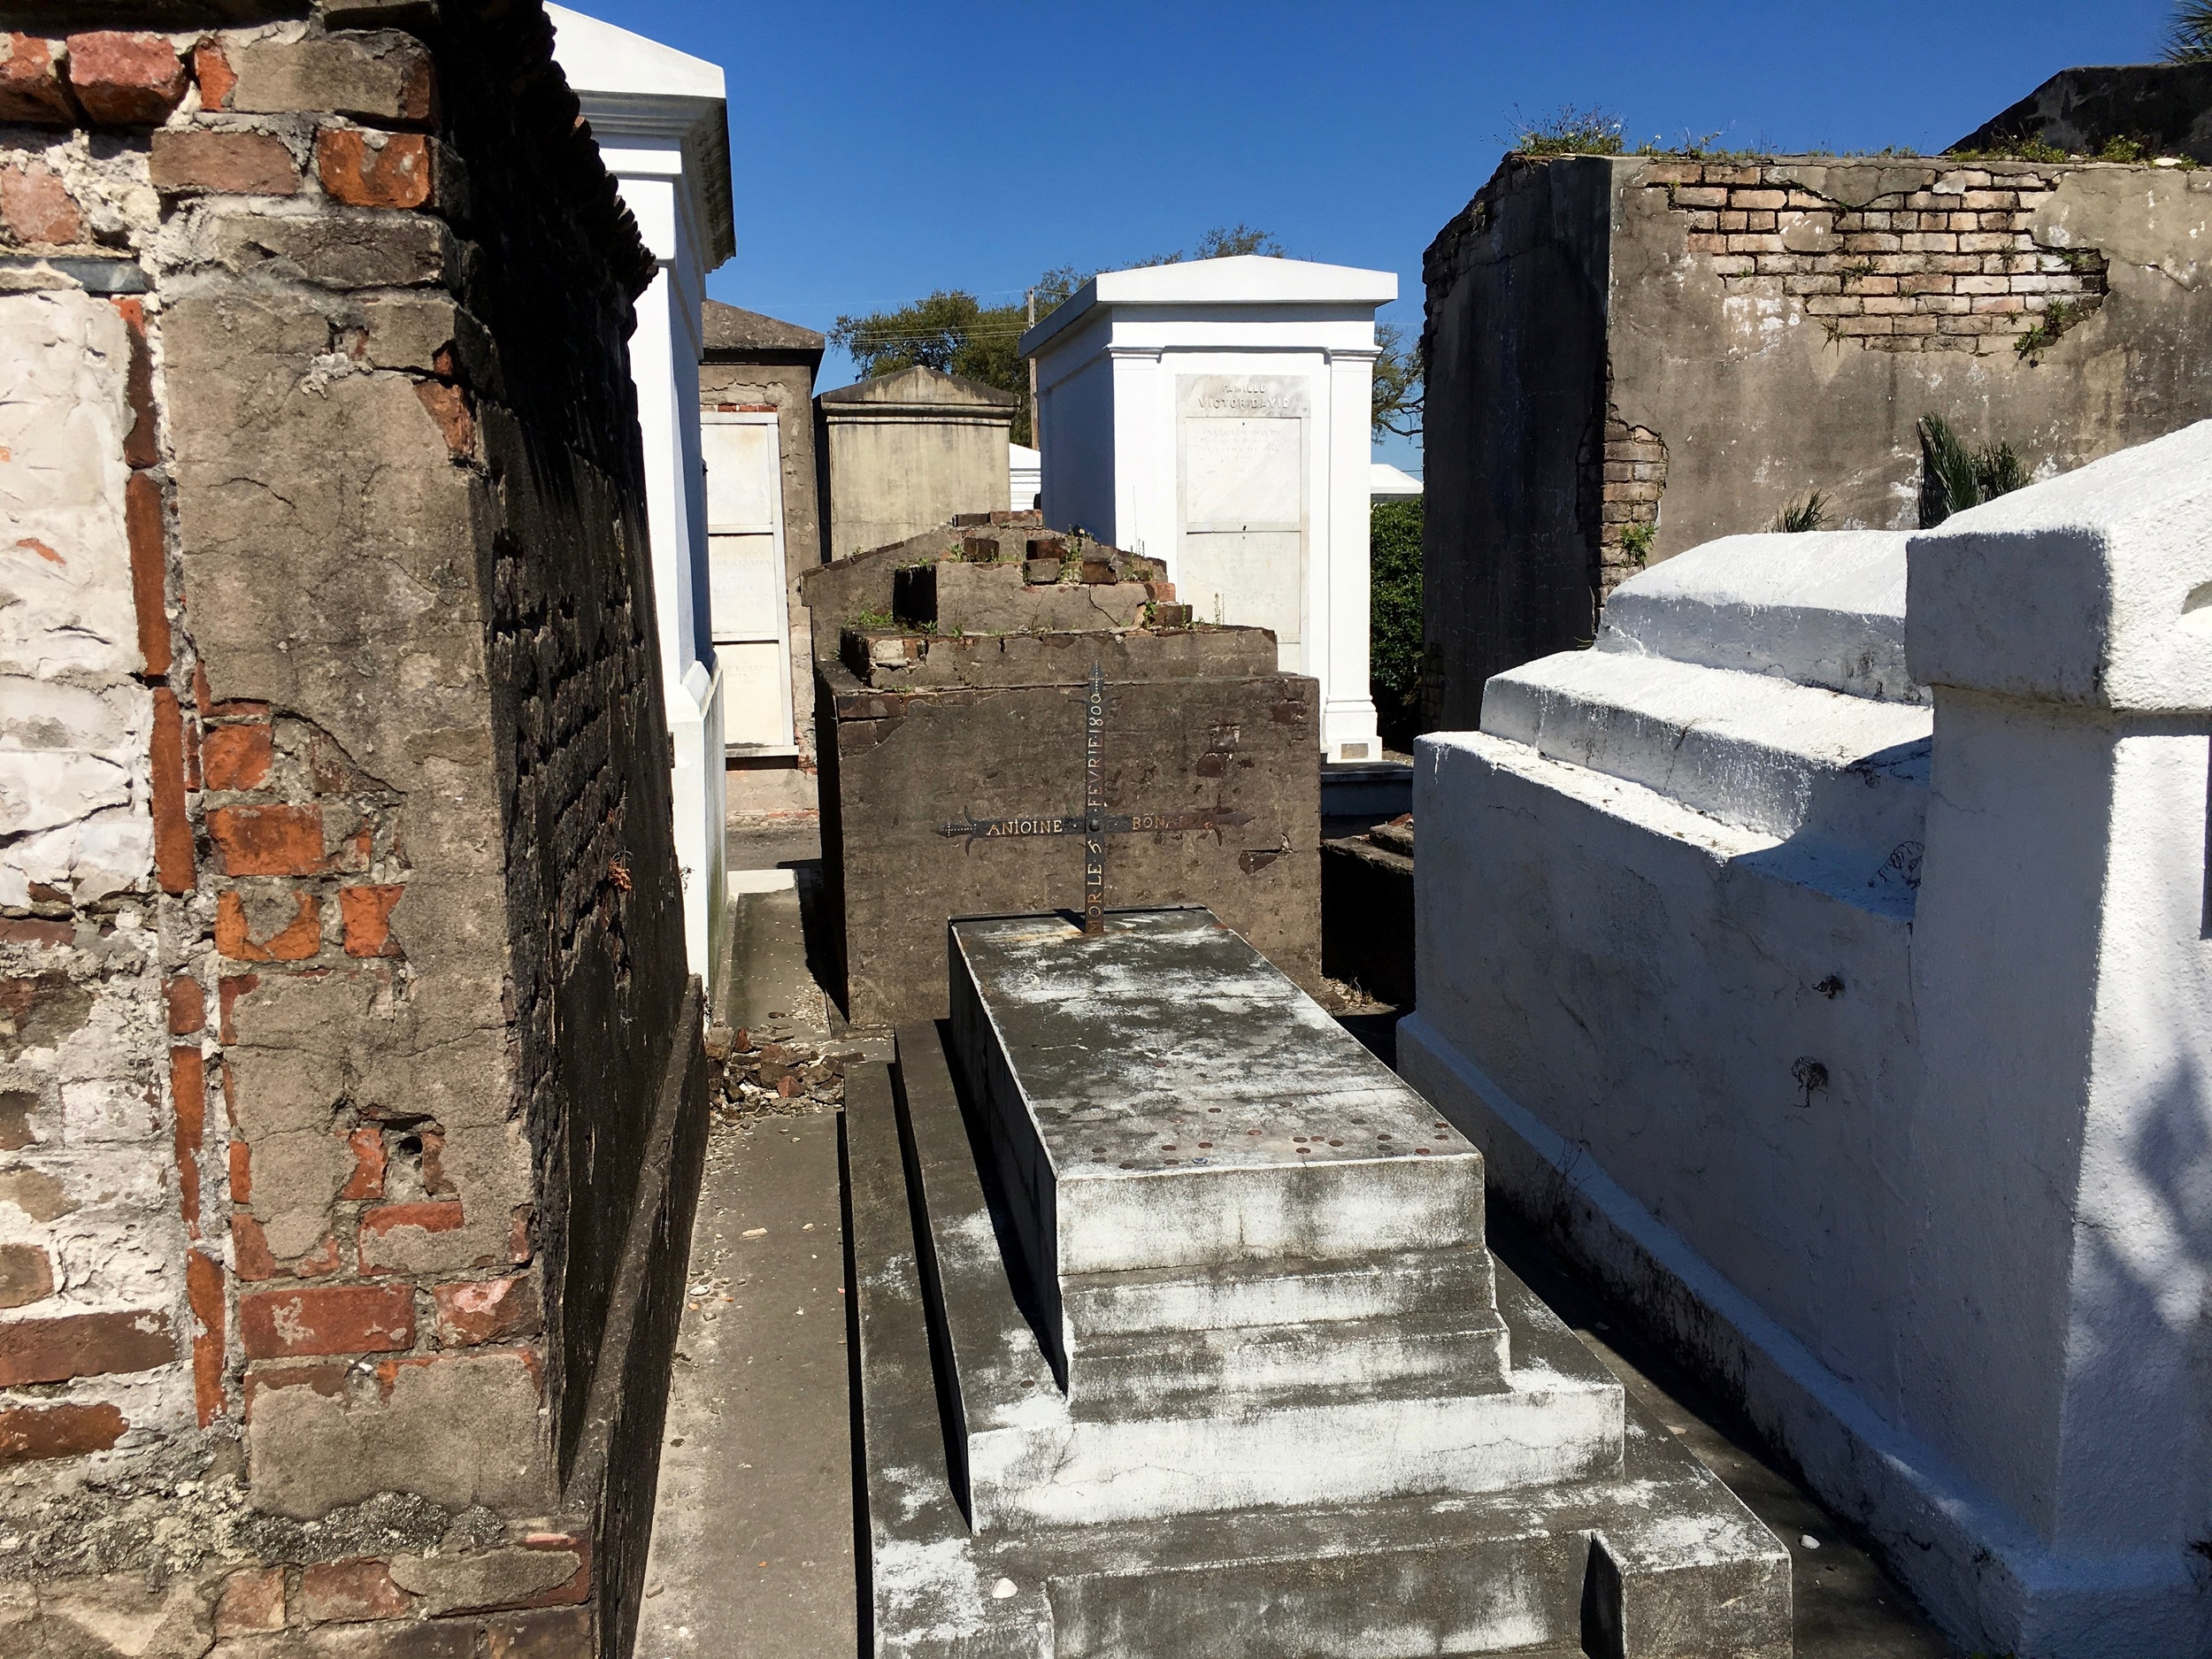 St. Louis Cemetery's oldest grave - 1800.